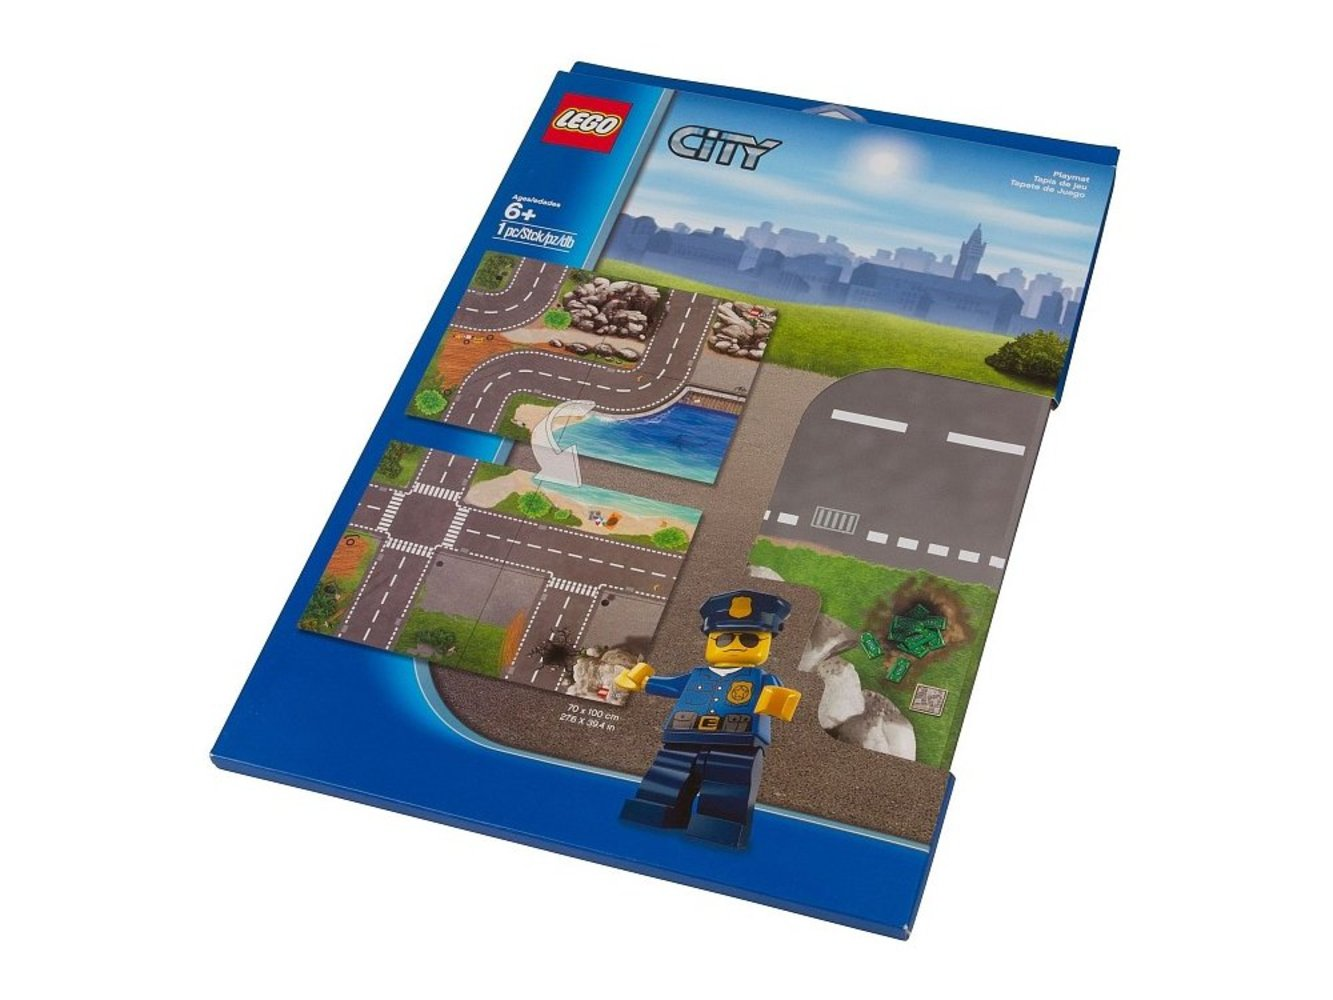 City Playmat